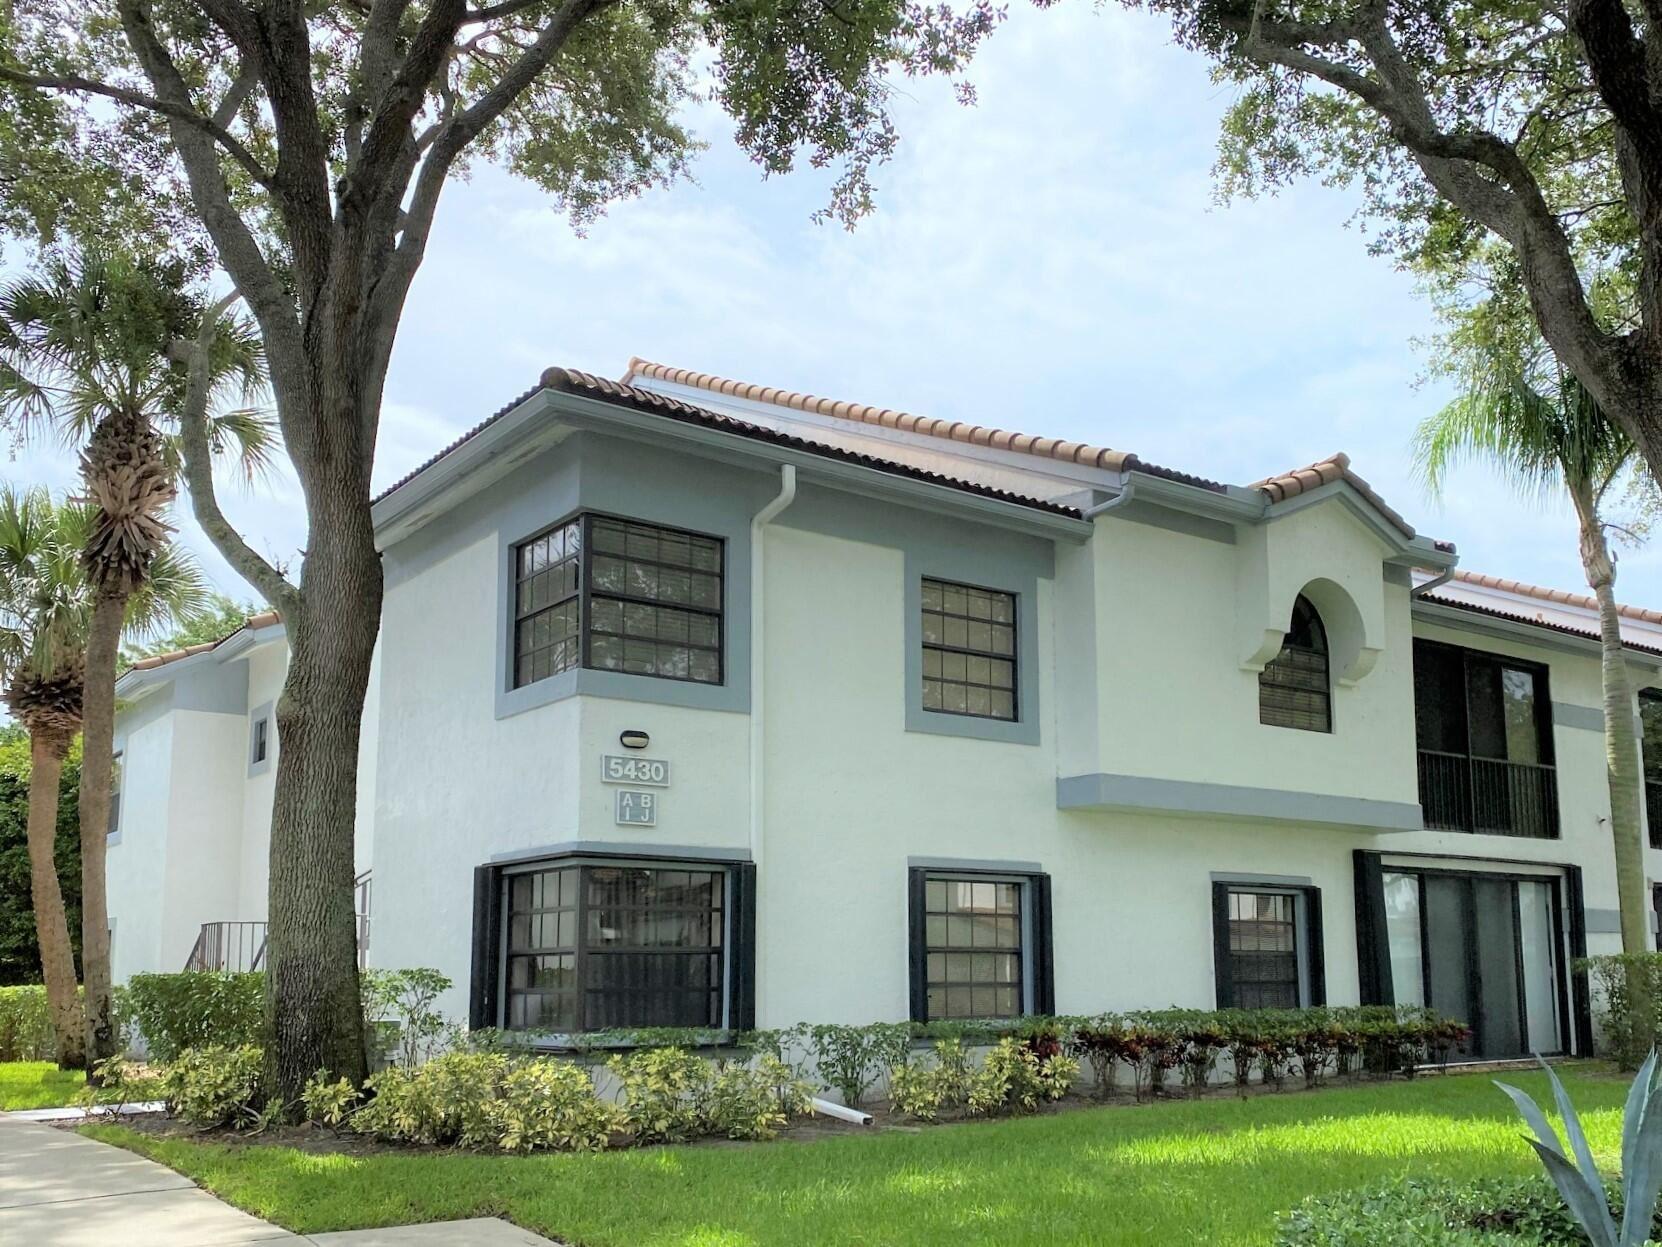 5430 Venetia Court #B, Boynton Beach, FL 33437 - MLS#: RX-10729592